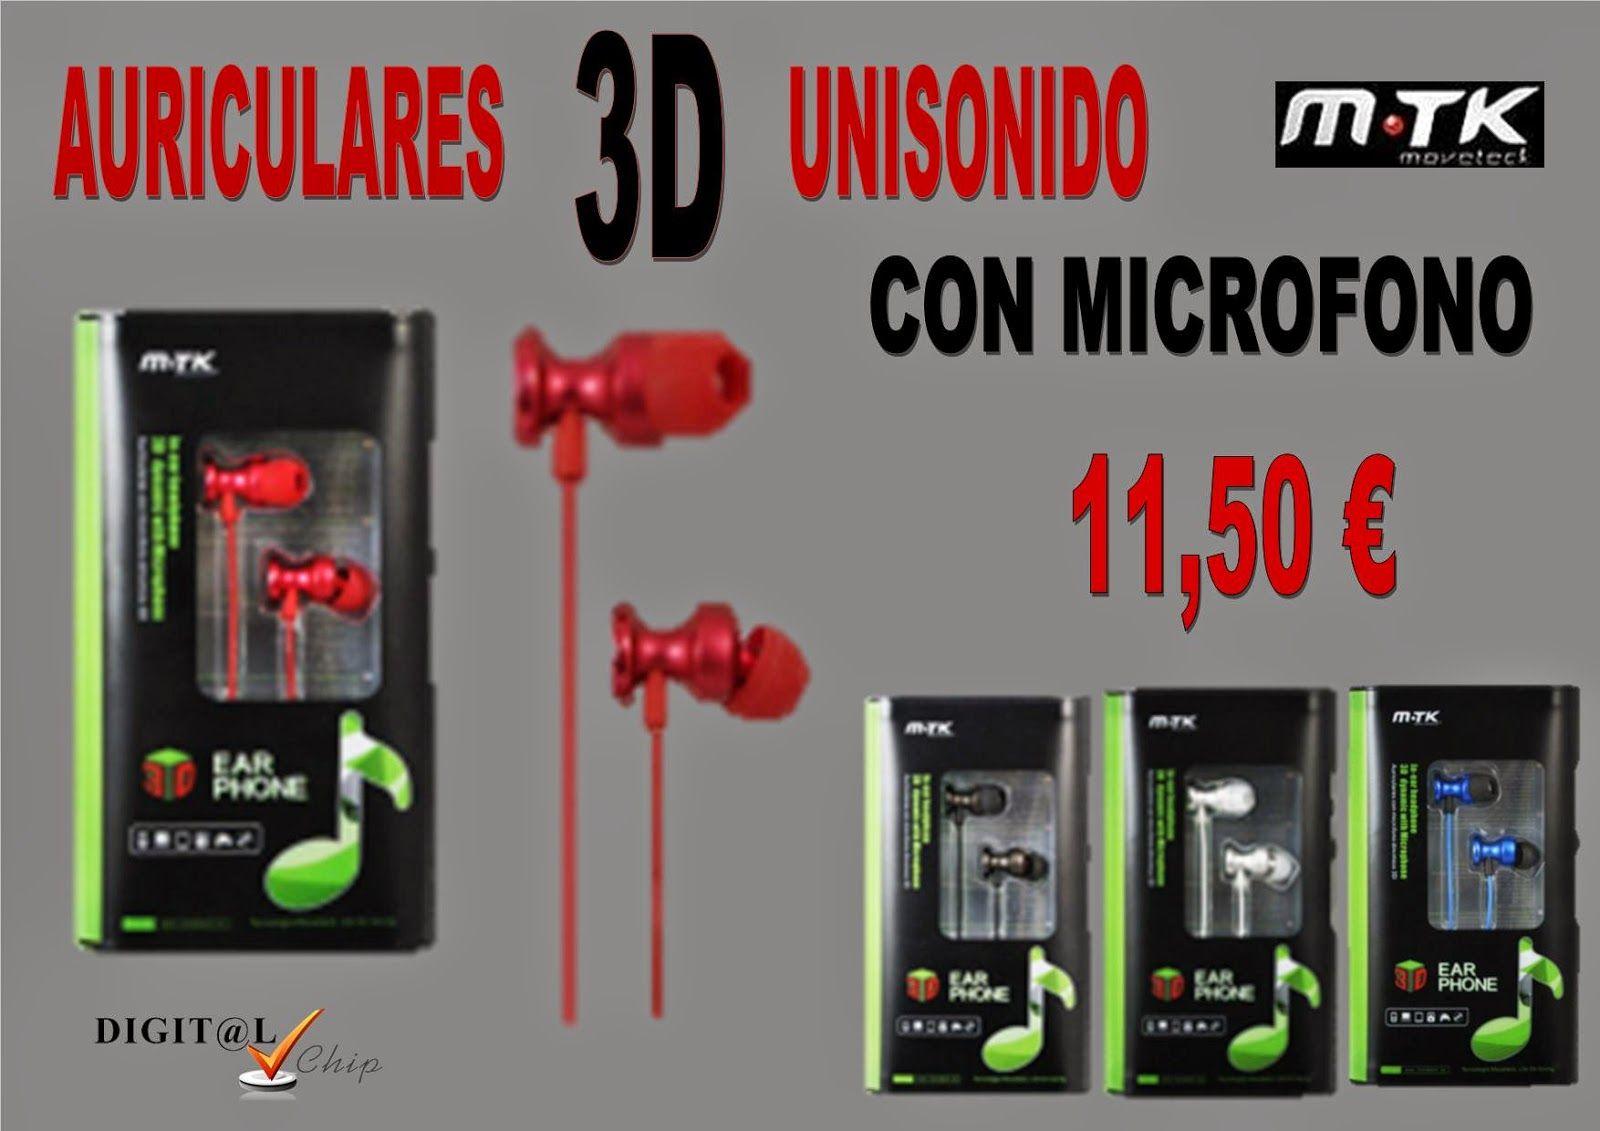 Digit@L Chip - Informática - Sonido: MTK - AURICULARES 3D  DE ALUMINIO CON MICROFONO